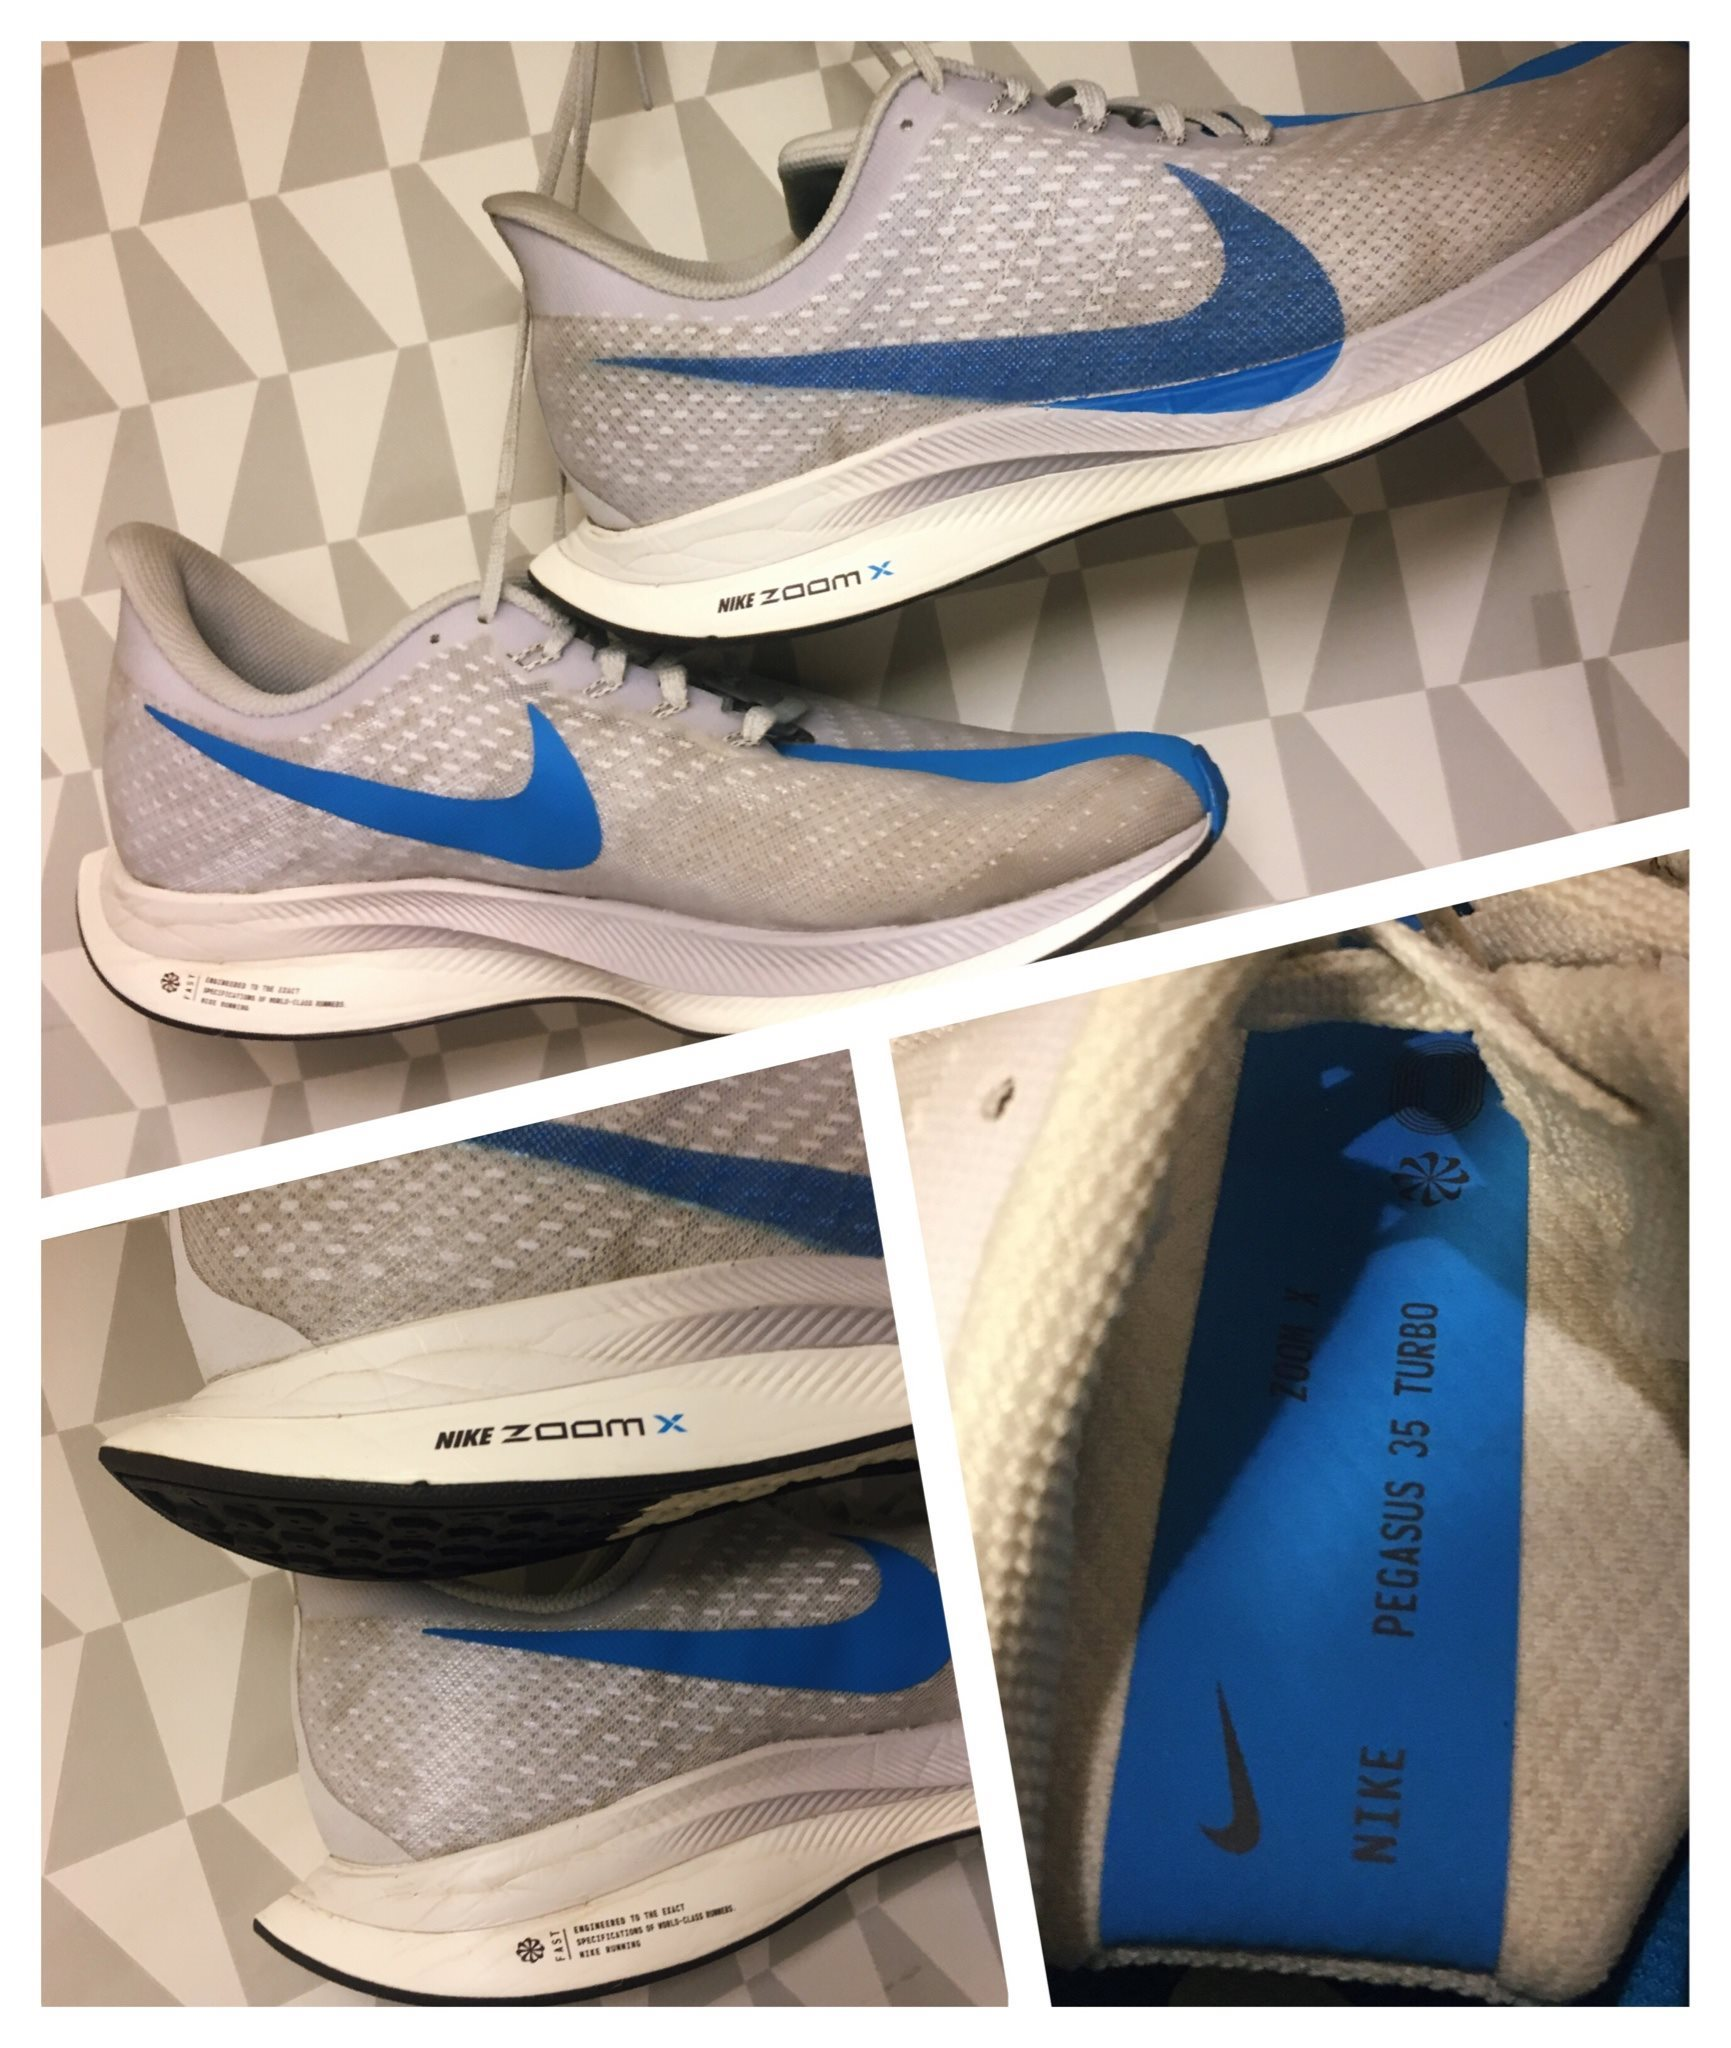 new style bb24b 11474 Nike Zoom Pegasus Turbo Herr Löparsko Running Training Träning Skor Vårmode  44,5